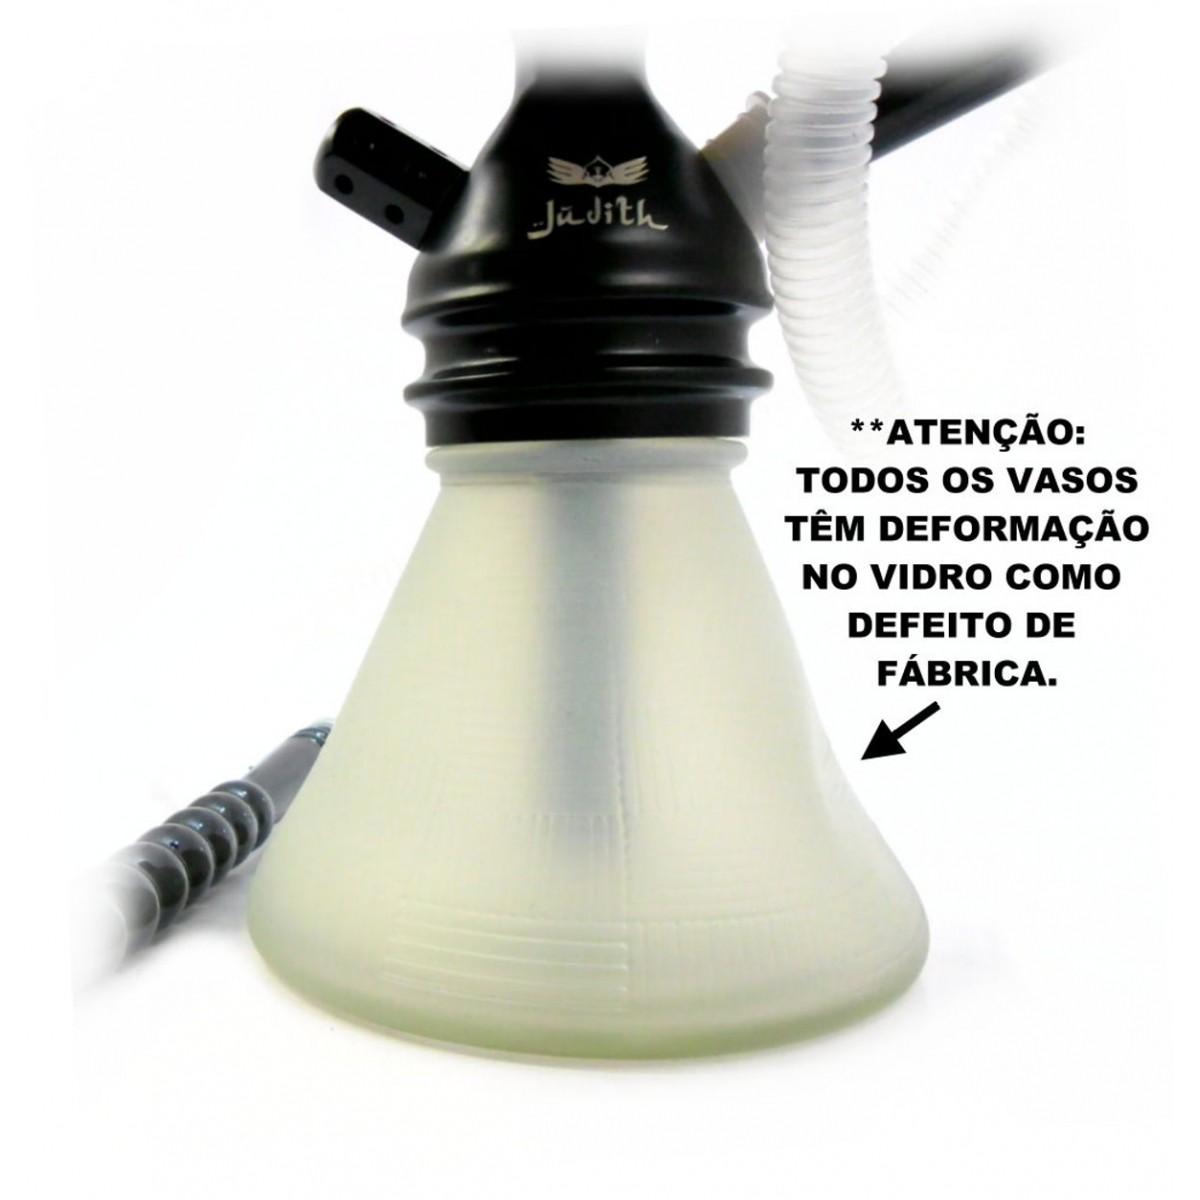 Narguile JUDITH POLIDO 33cm, vaso Petit BRANCO, mangueira GO HOSE, fornilho Flux Bowl PRETO, prato El Nefes PRETO